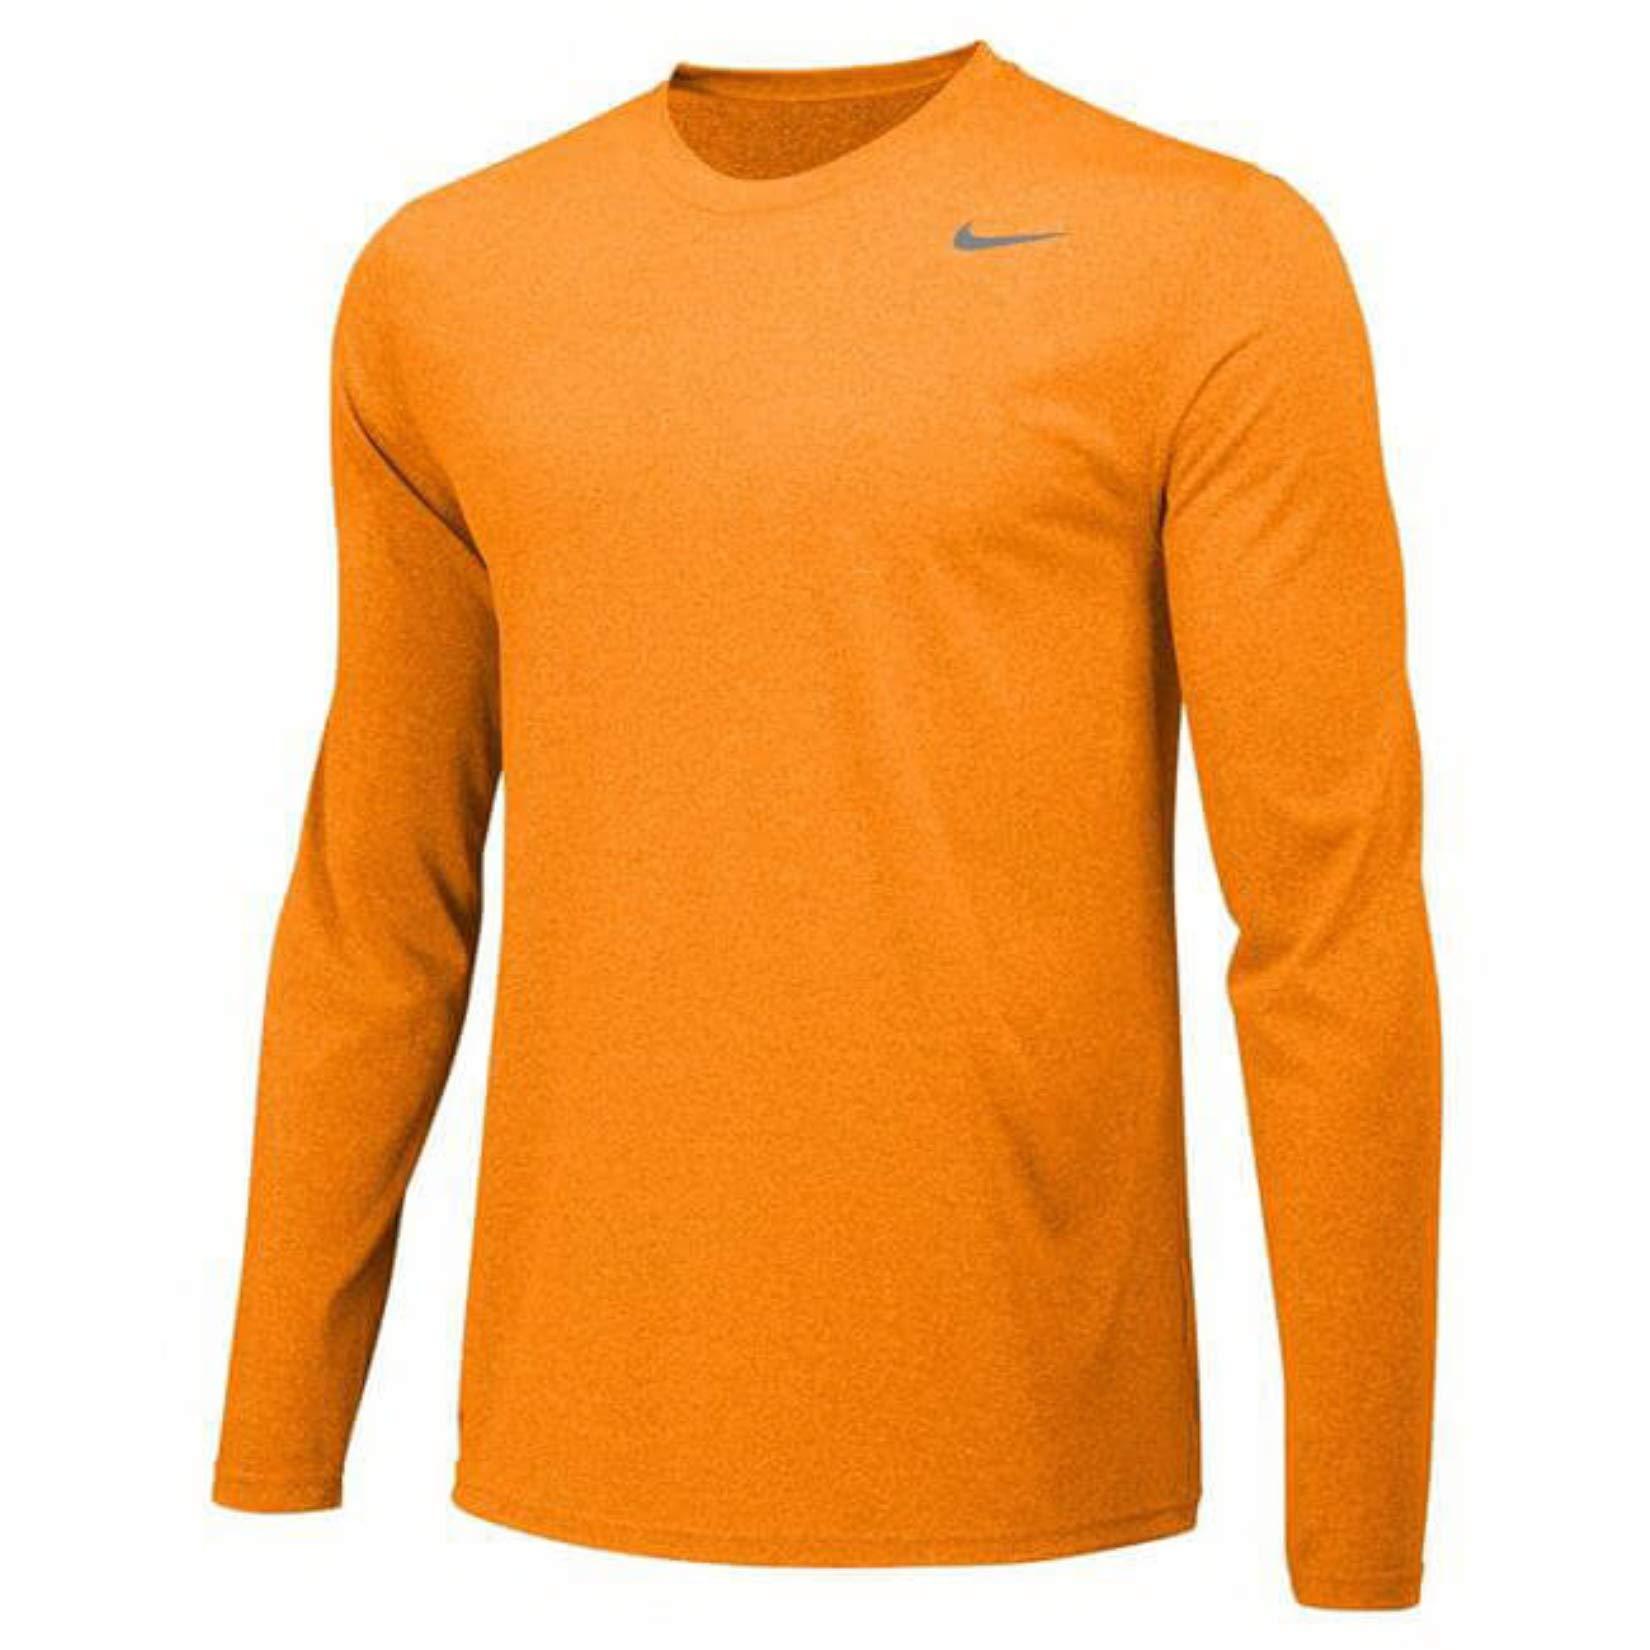 Nike Men's Legend Long Sleeve Tee (Small, Bright Ceramic/Cool Grey)